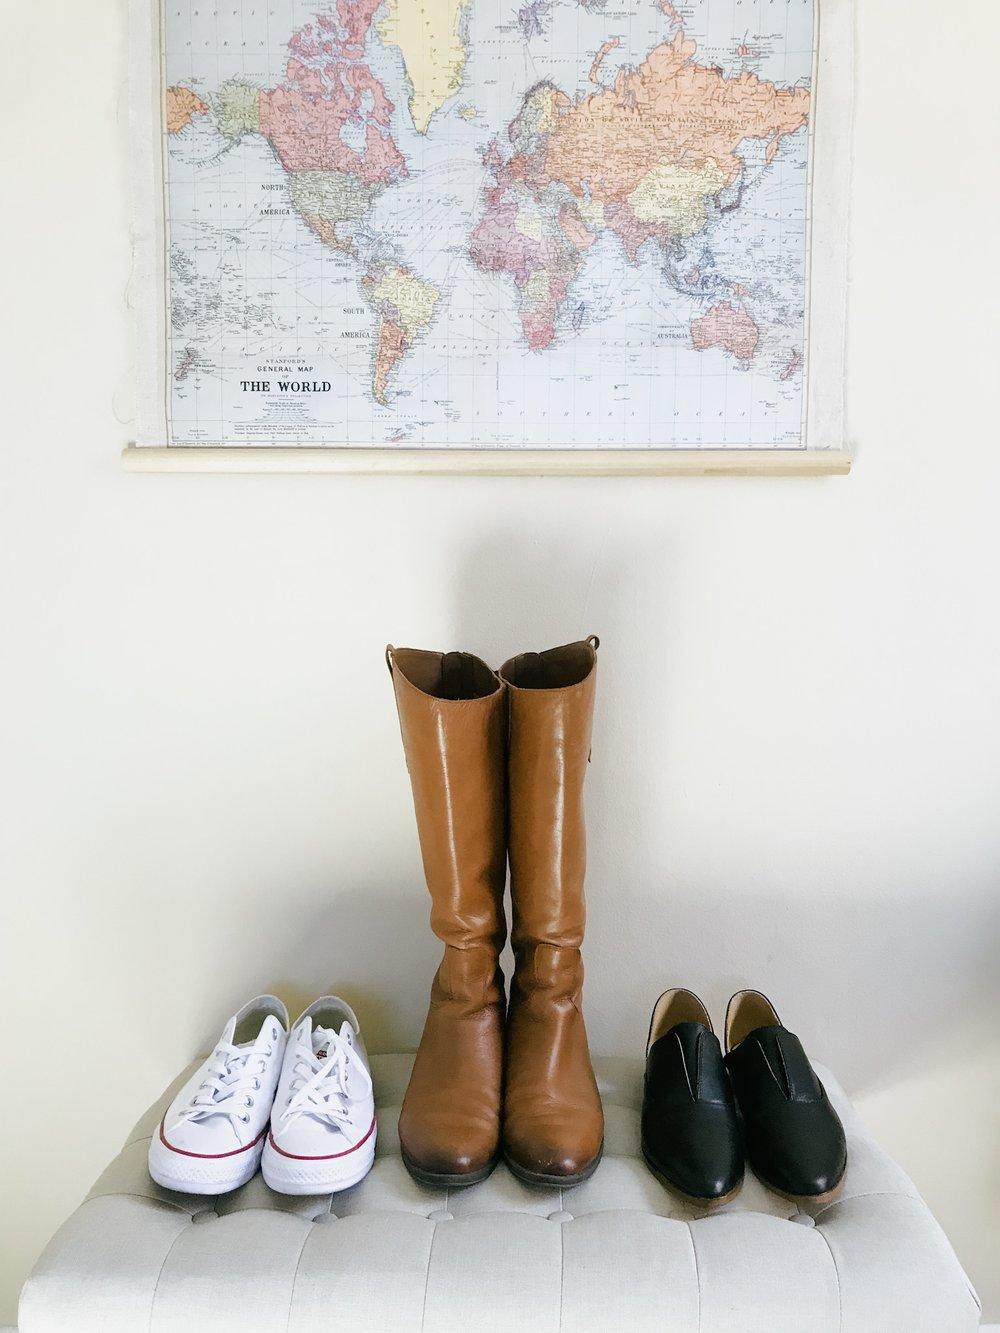 minimalism minimalist simple living world map travel